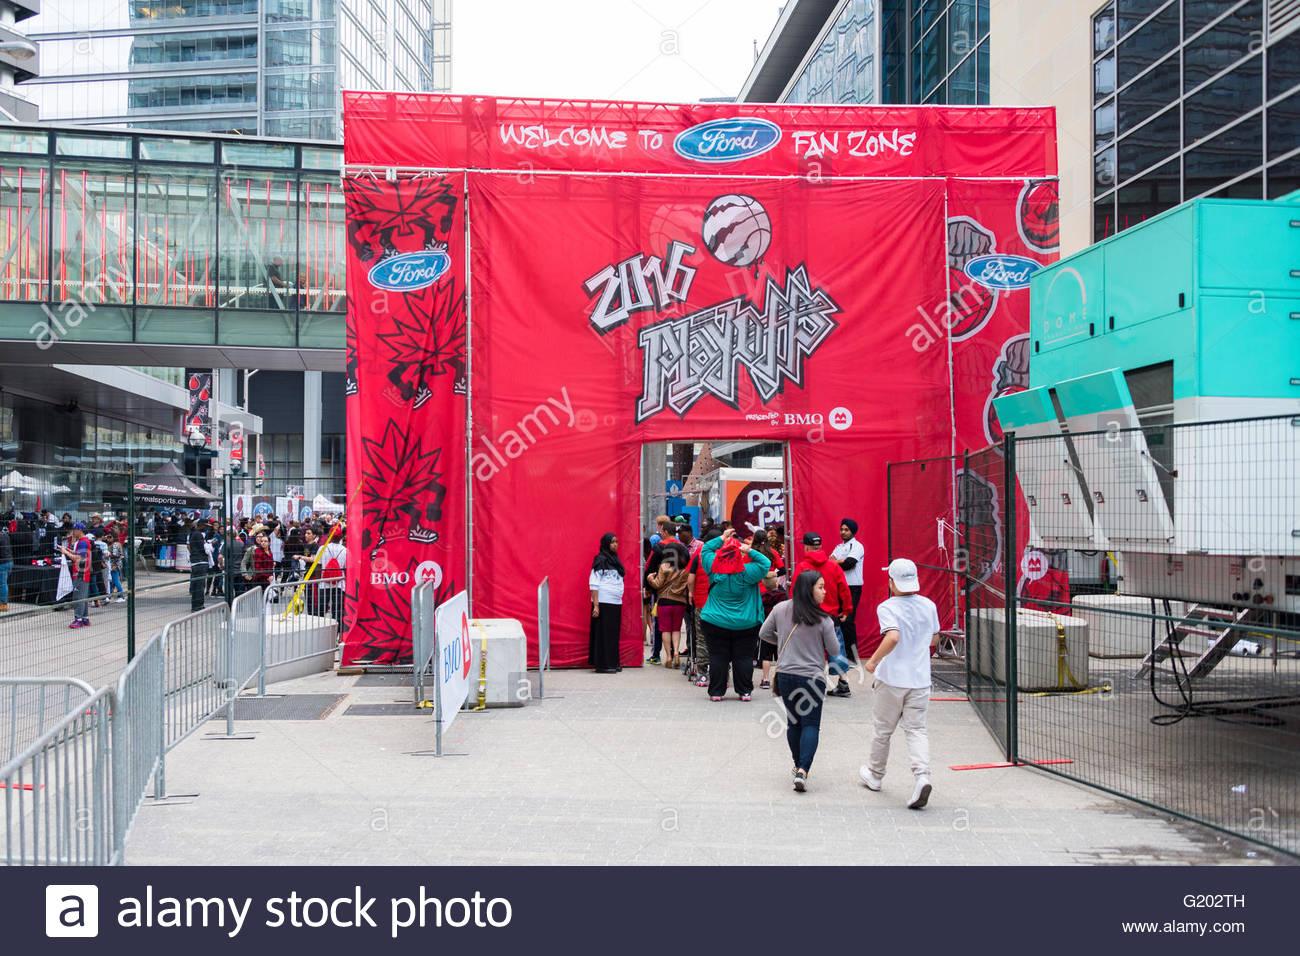 Raptors basketball team fans entering the  Ford fan zone better known as the 'Jurassic Park' fan zone. - Stock Image